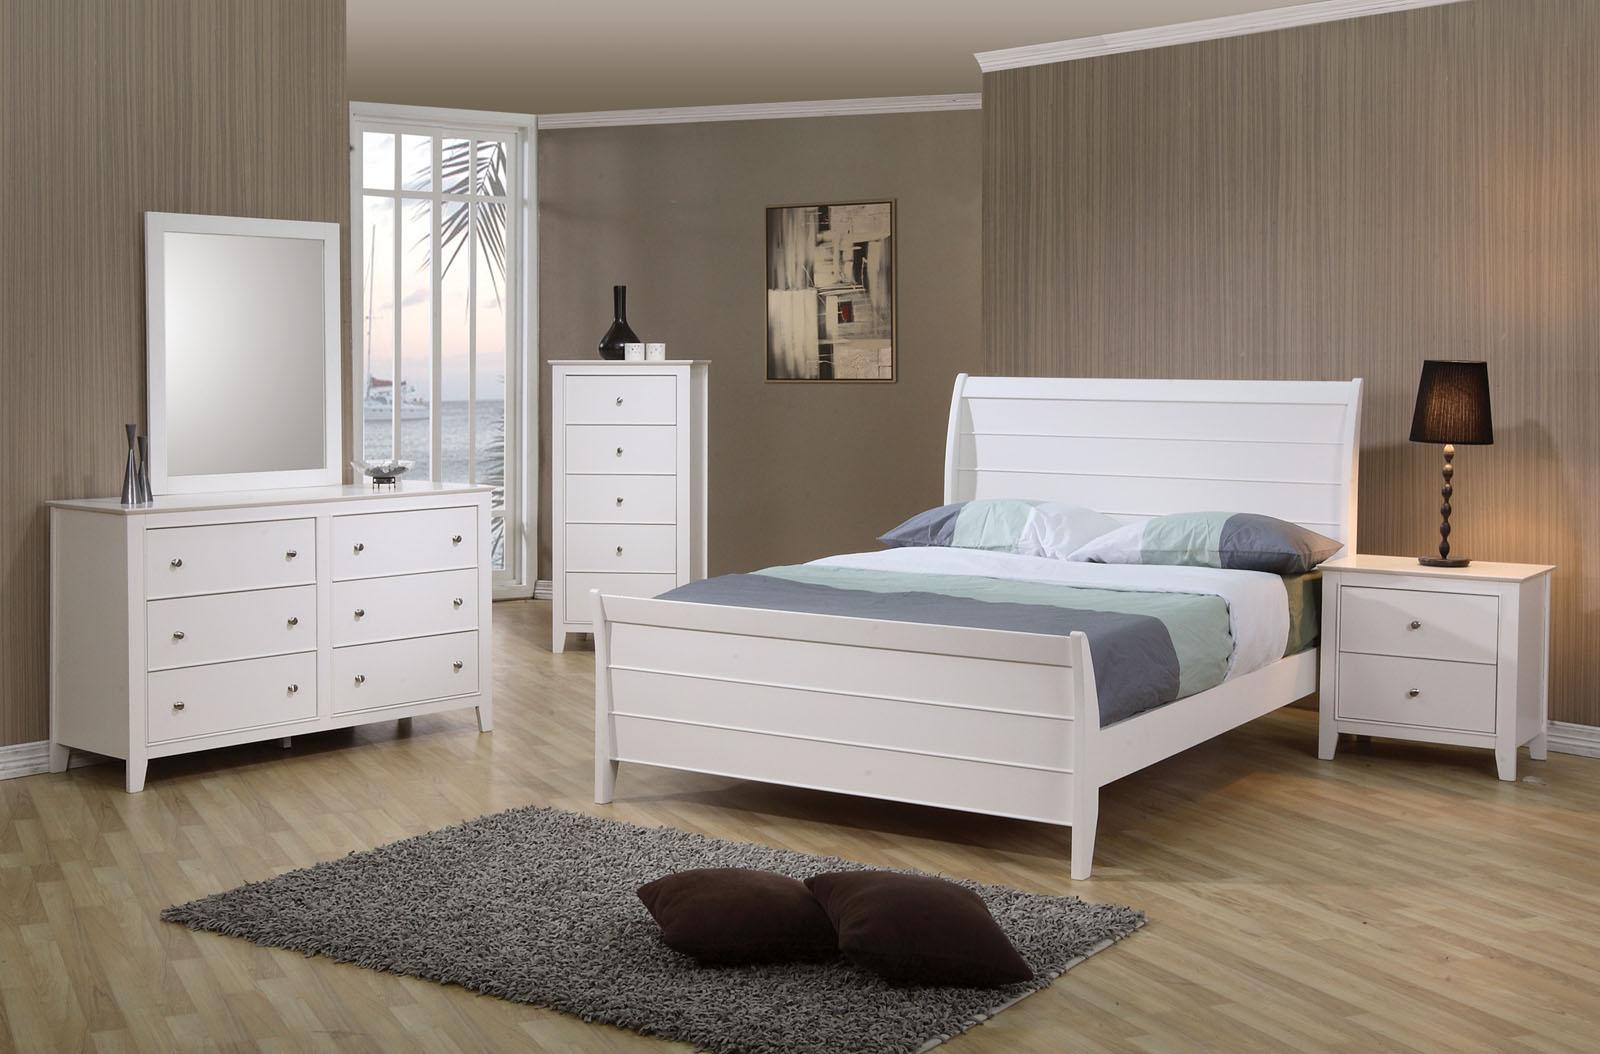 bedroom furniture sets full size photo - 7